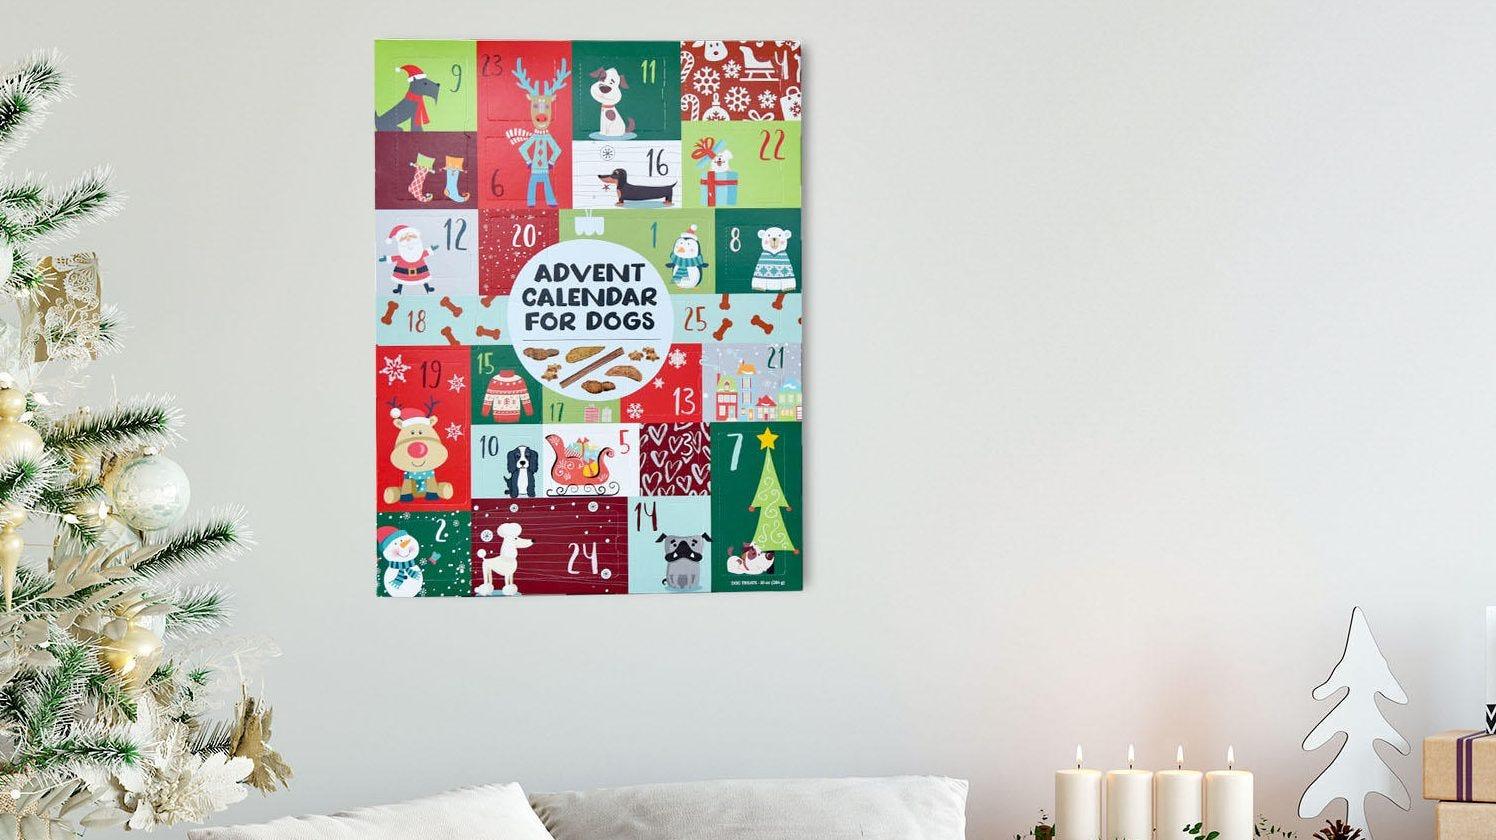 A dog adven calendar hangs above a couch.